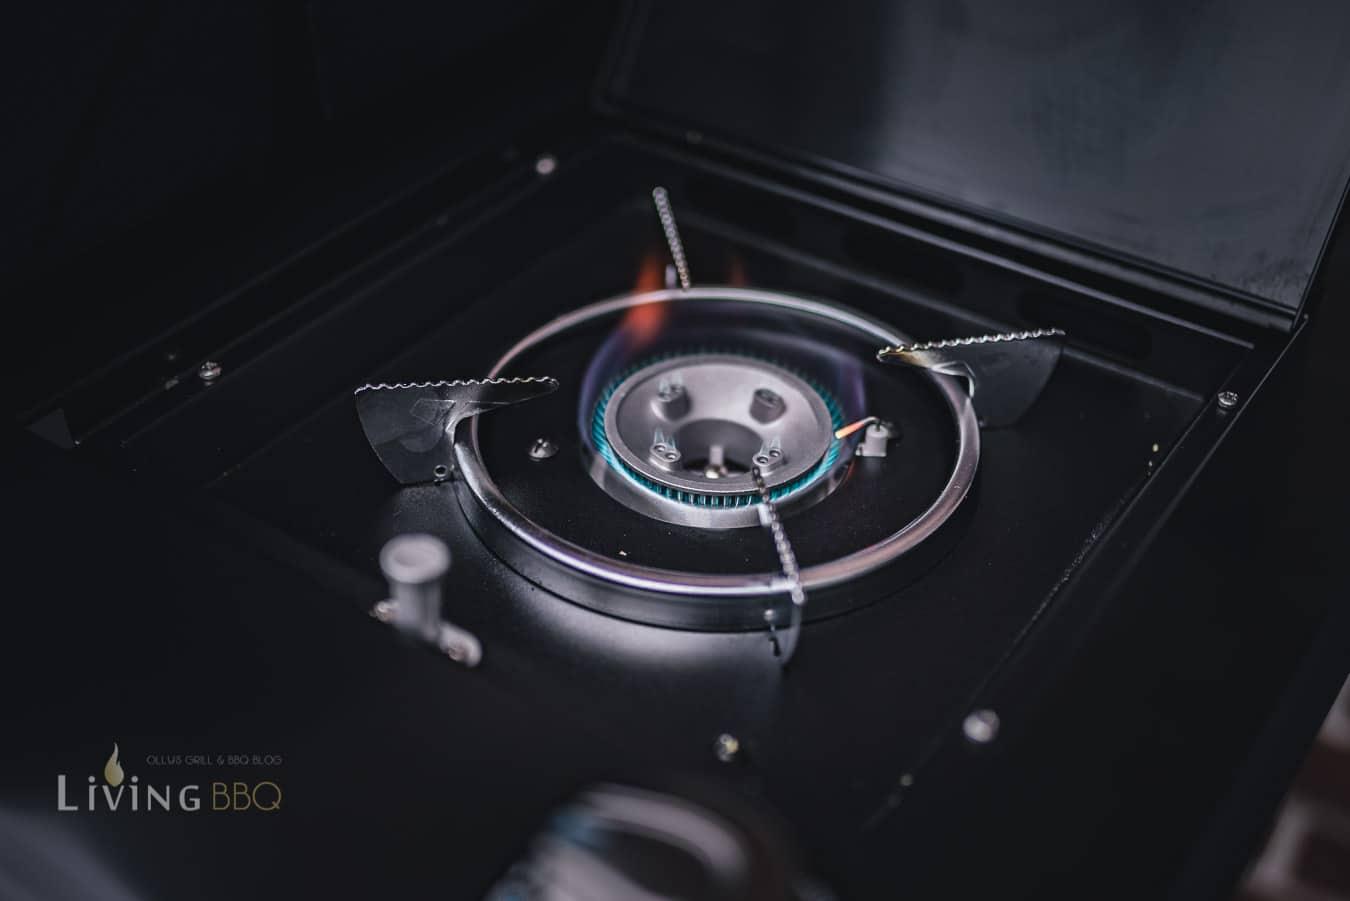 Seitenkocher des Campingaz 4 Series Onyx S